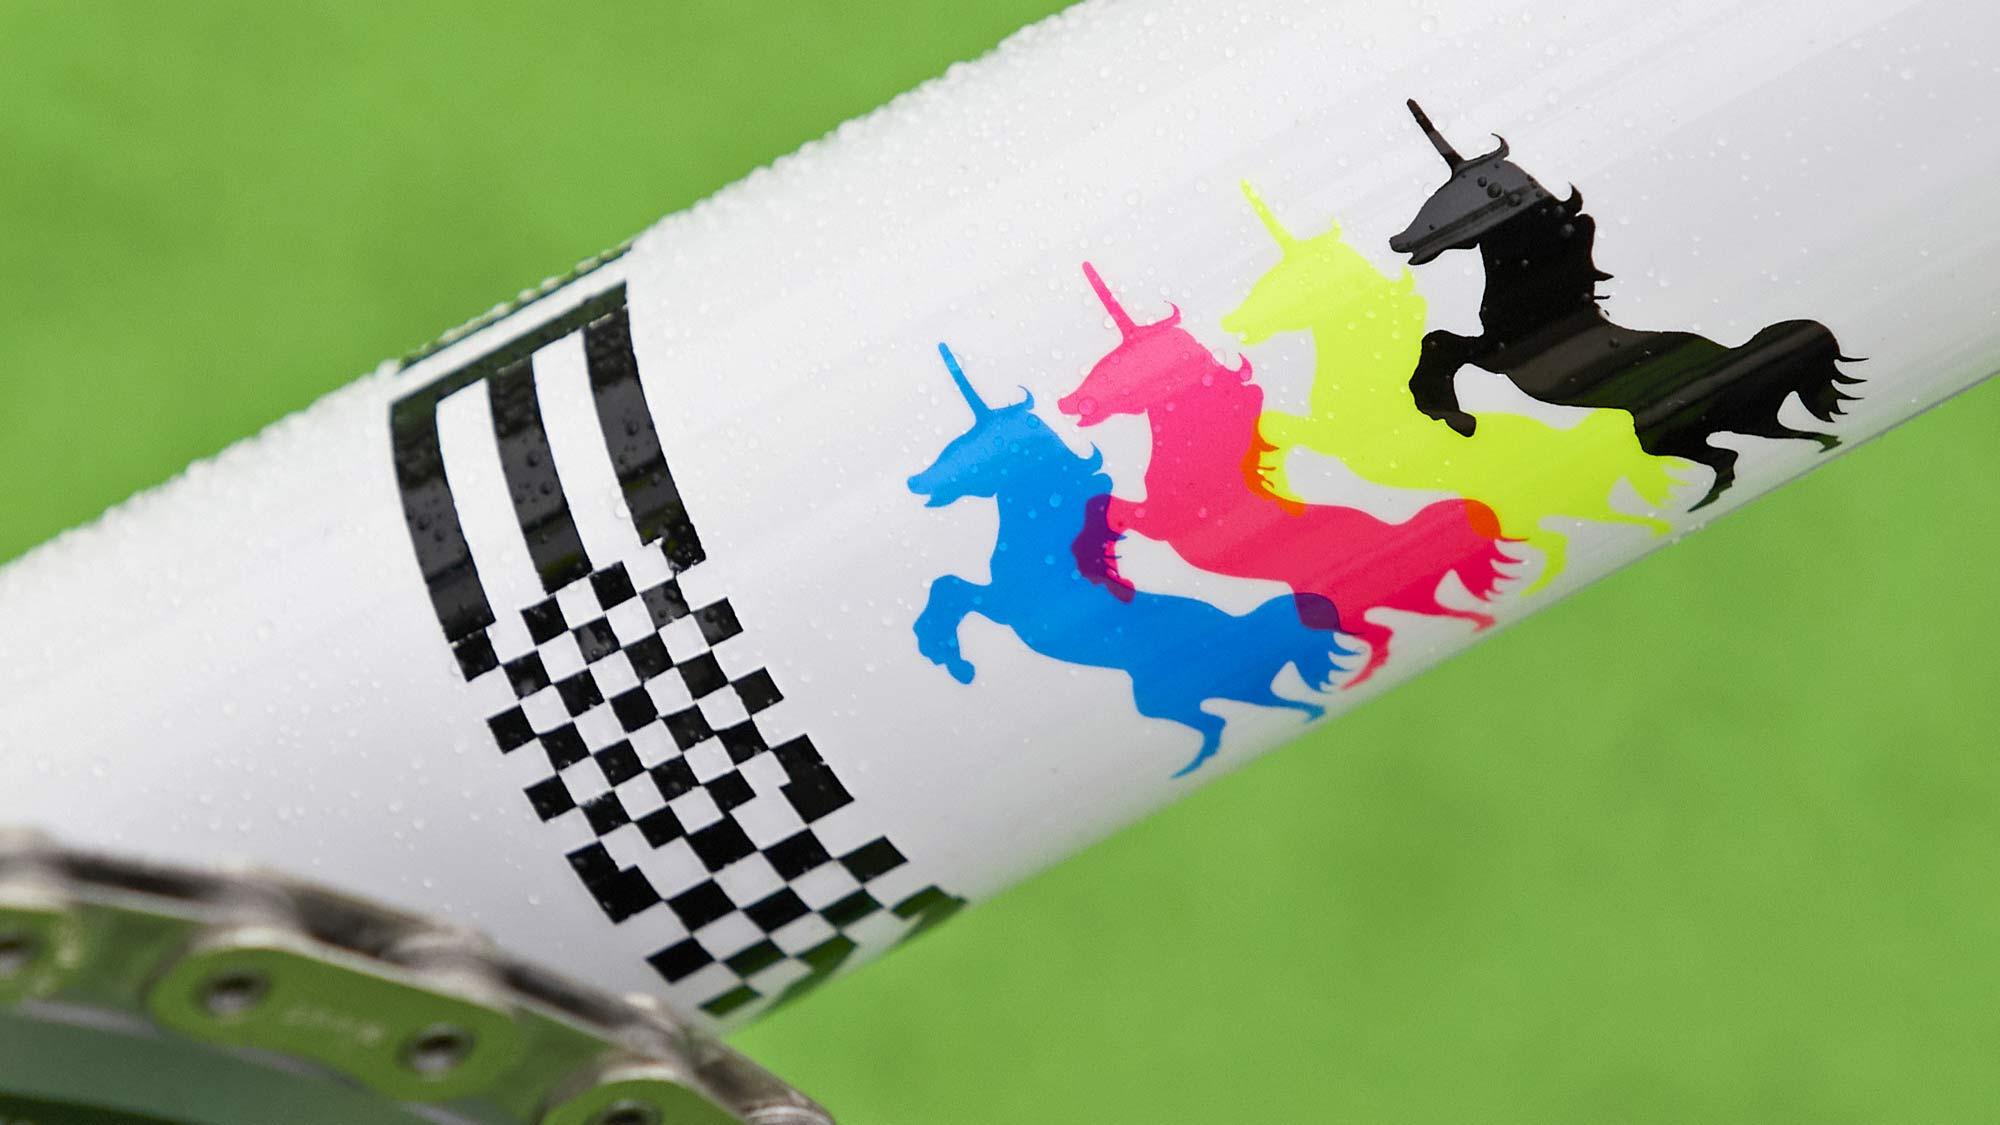 2021-2022 Speedvagen Surprise Me series, full-custom Vanilla workshop road bike with surprise paintjob inspired by printers proofs, The Painters Proof CMYK edition, dancing unicorns